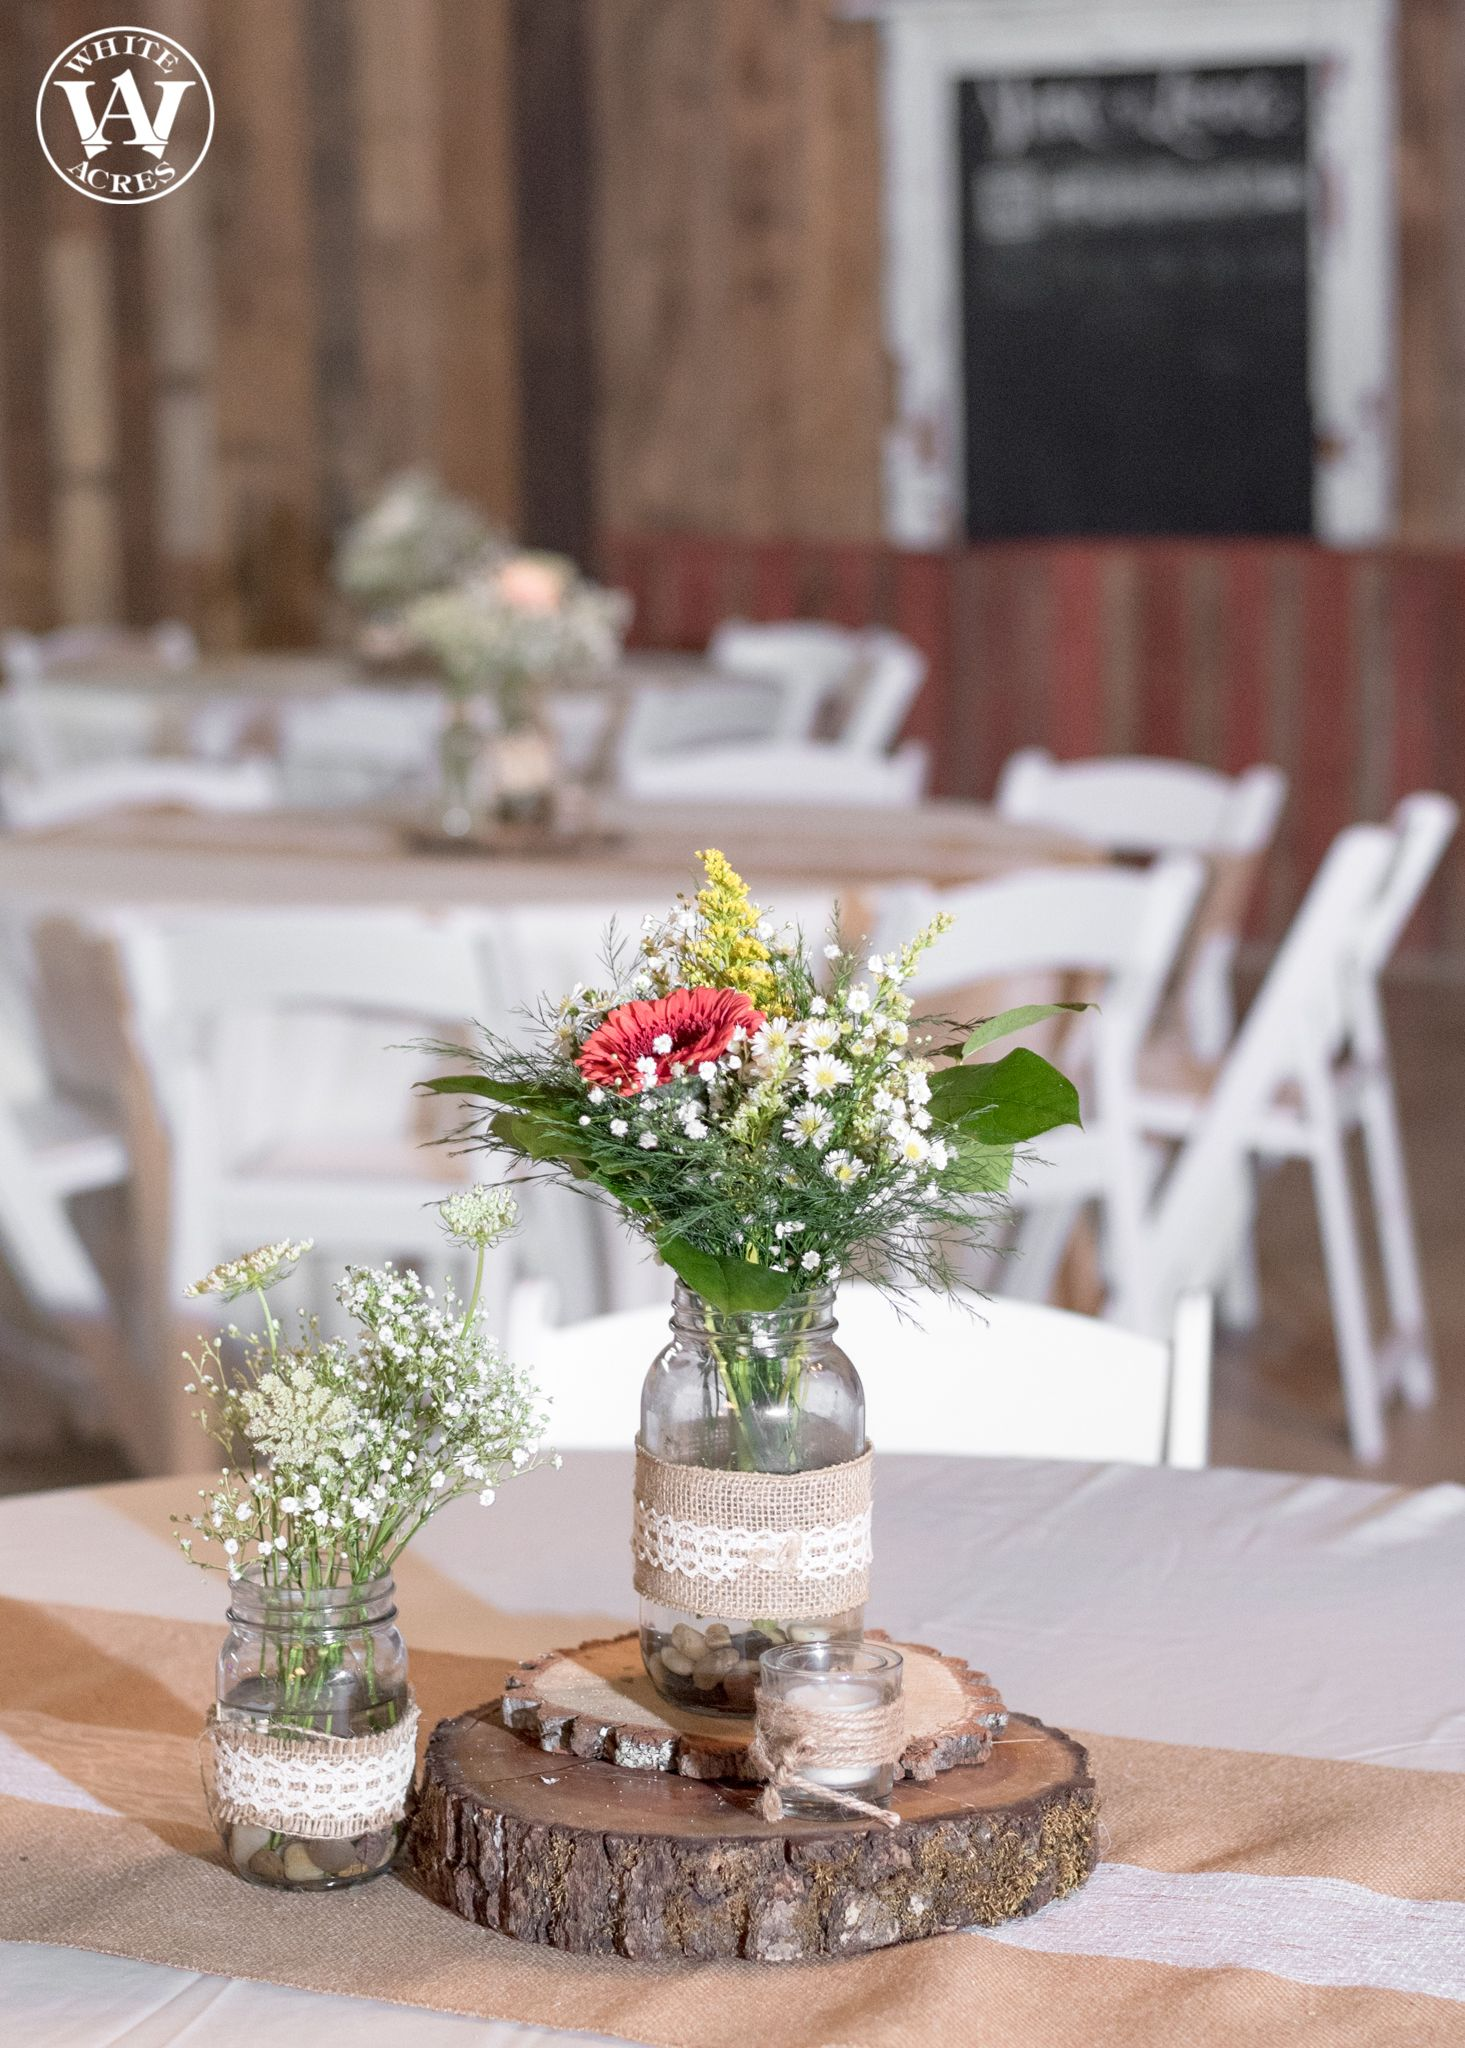 Wedding ceremony barn, wedding décor, summer wedding, wedding reception. Rustic barn wedding and reception venue in Alabama whiteacresfarms.com